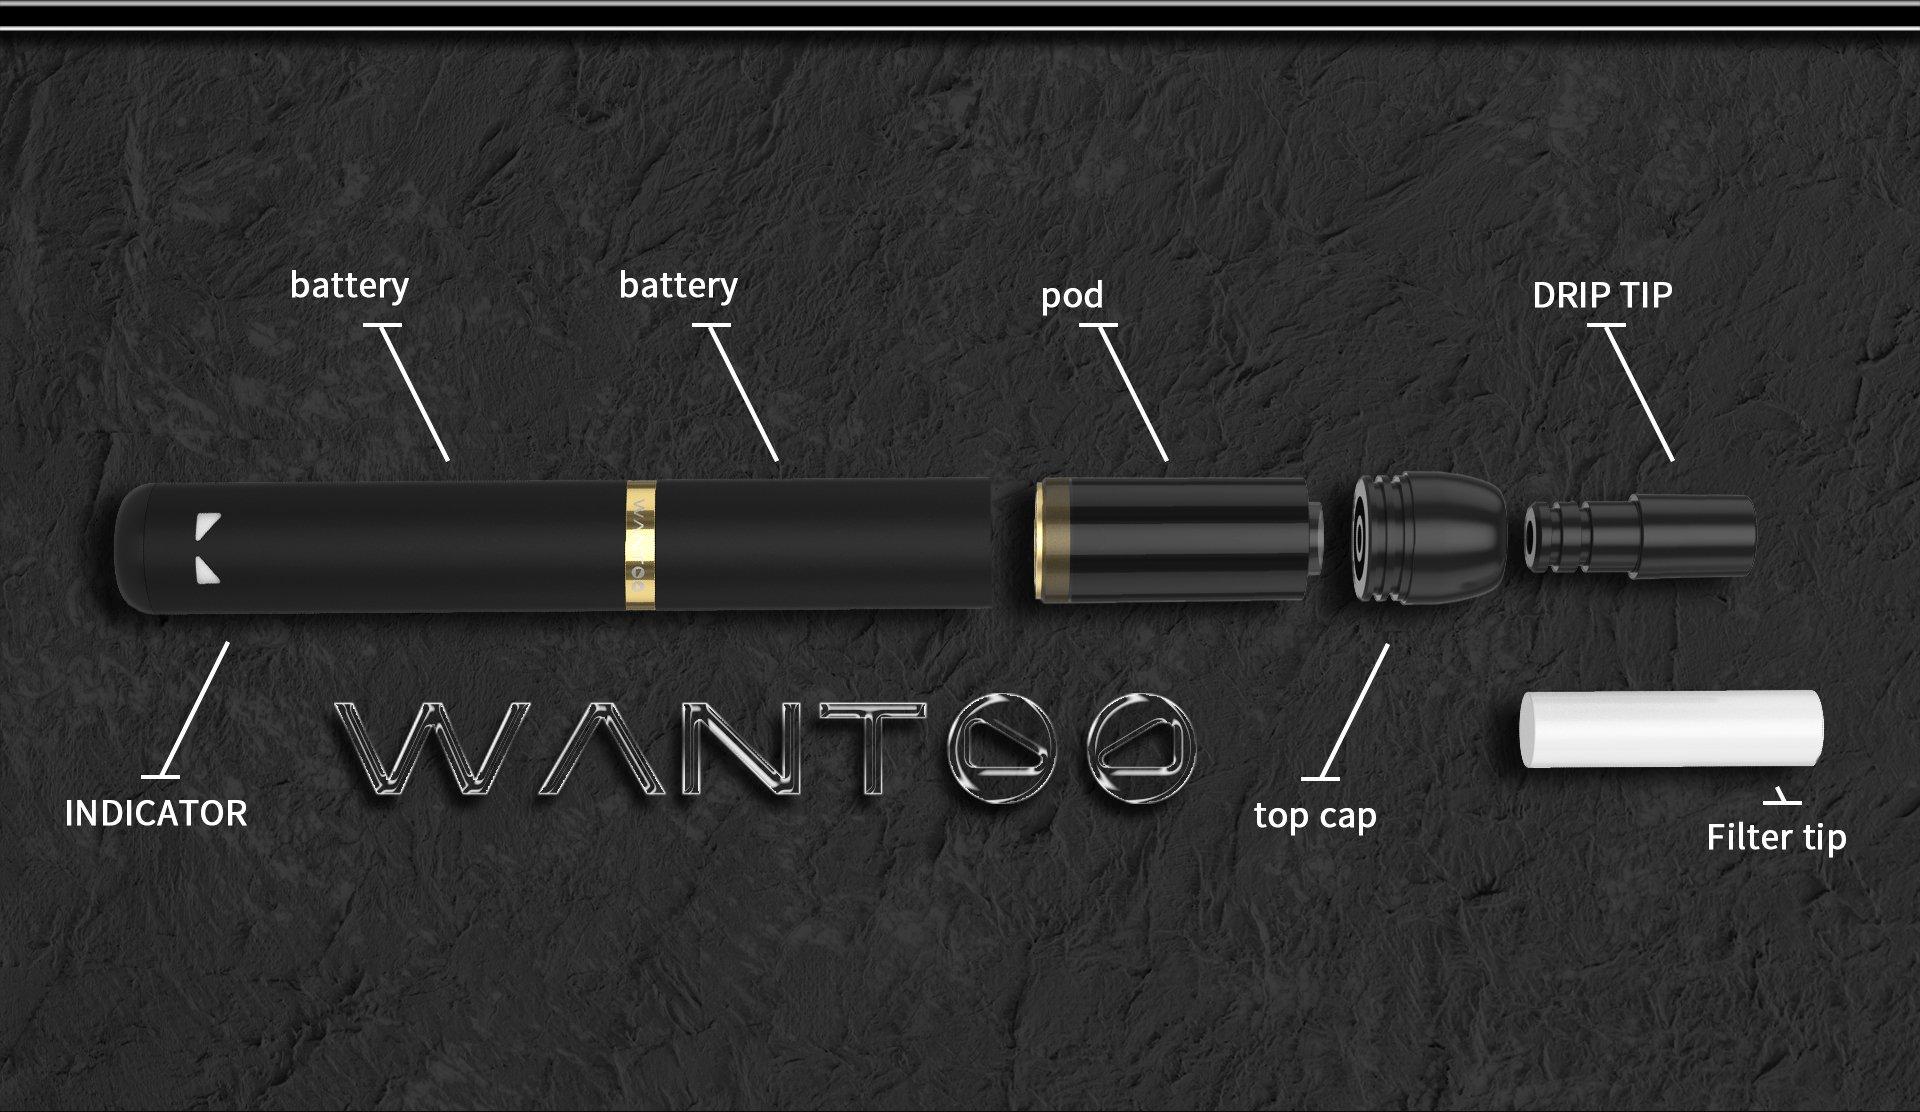 Wantoo Kit